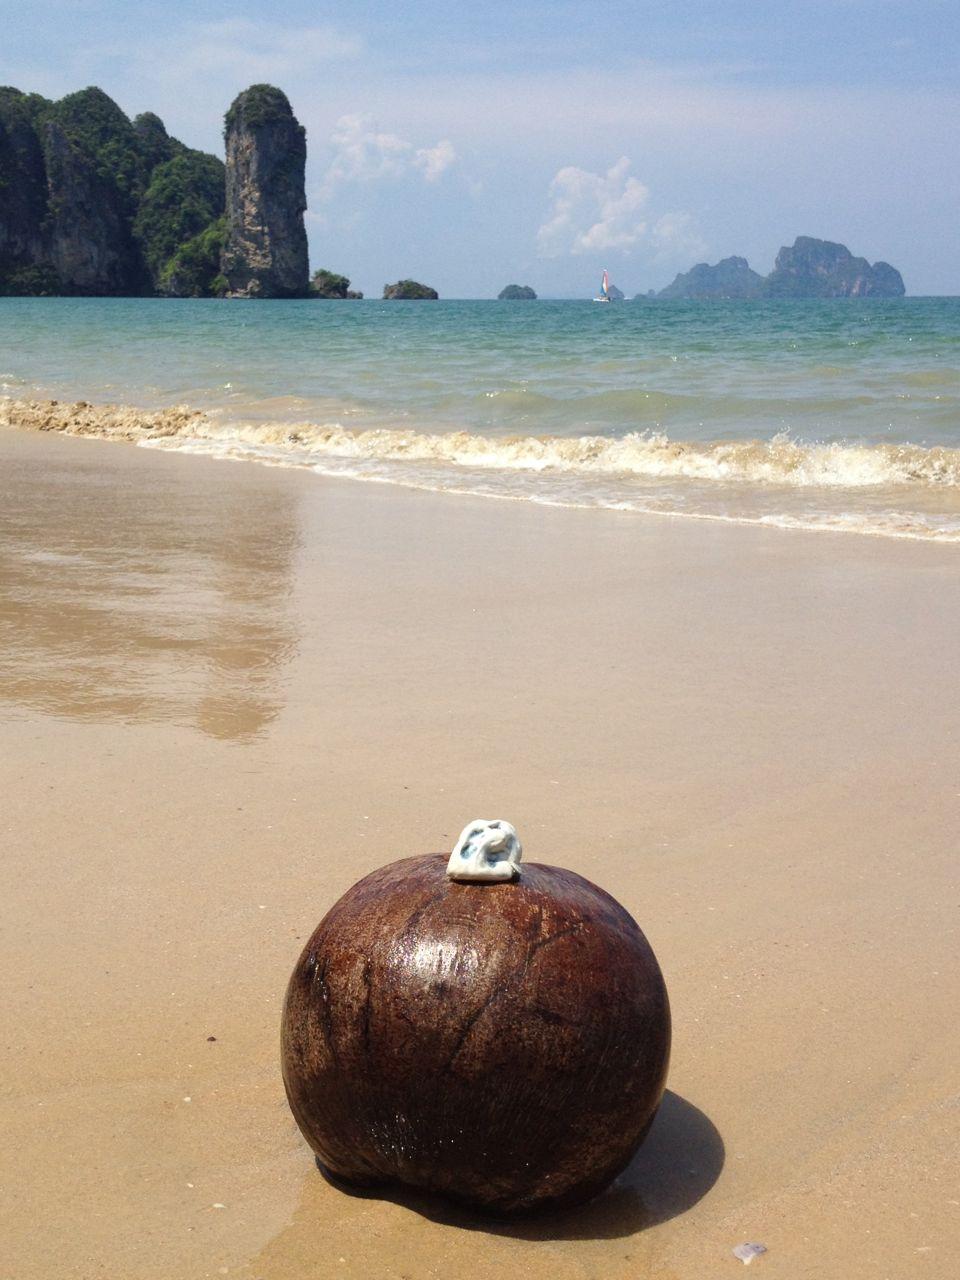 ao nang . krabi . thailand 01.05.14